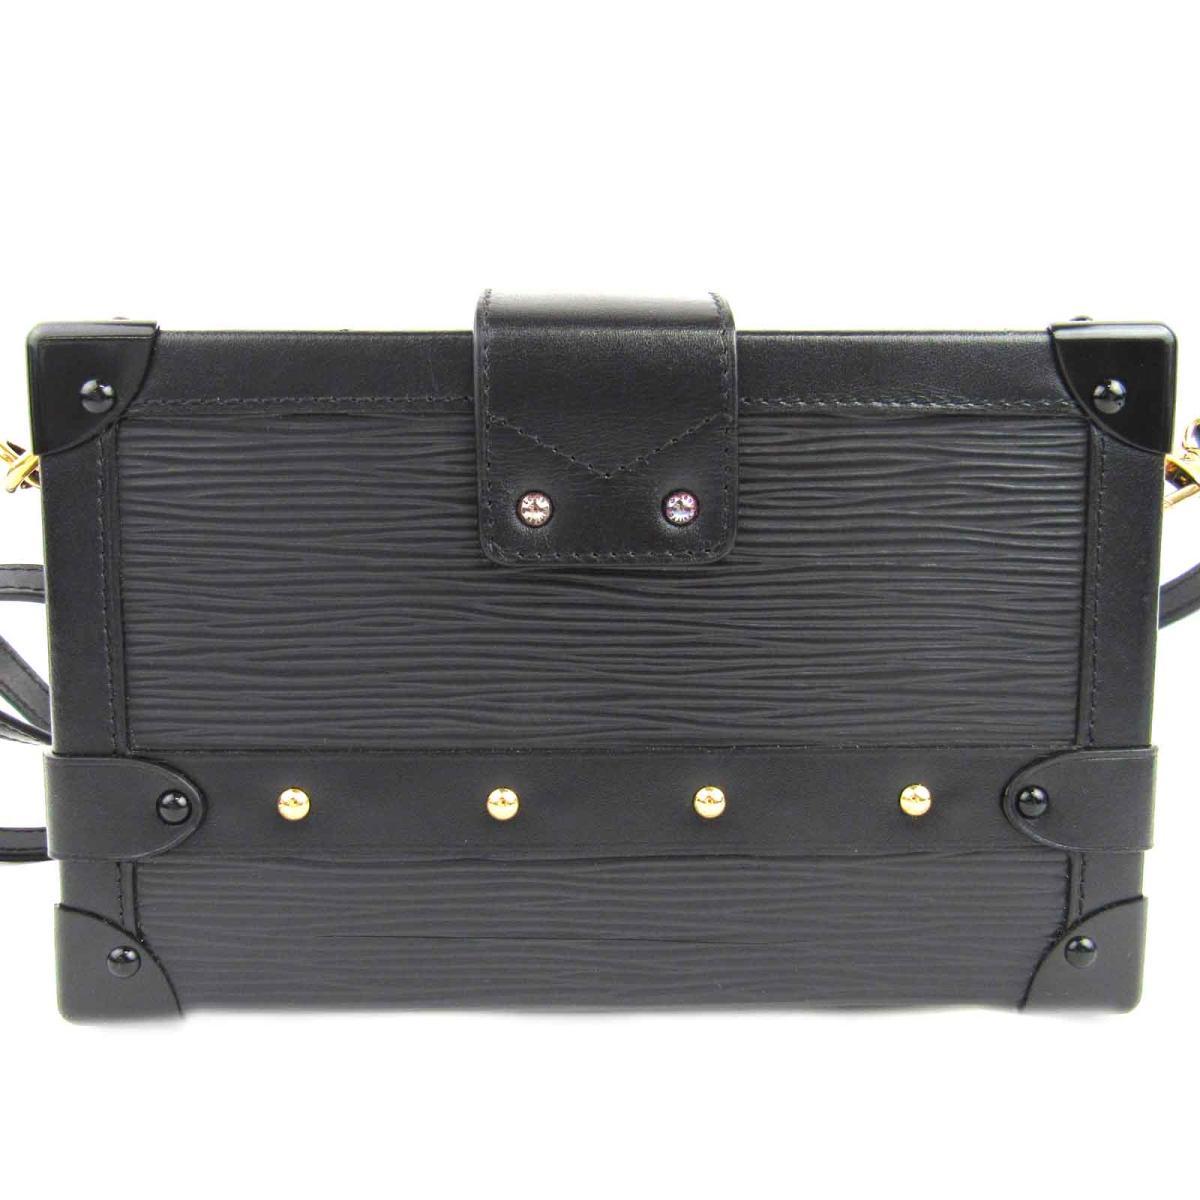 ccb4d47e0e8 BRANDOFF: Auth LOUIS VUITTON Petite Malle Shoulder bag box M5001N Epi Noir  Used   BRANDOFF Ginza/TOKYO/Japan   Rakuten Global Market